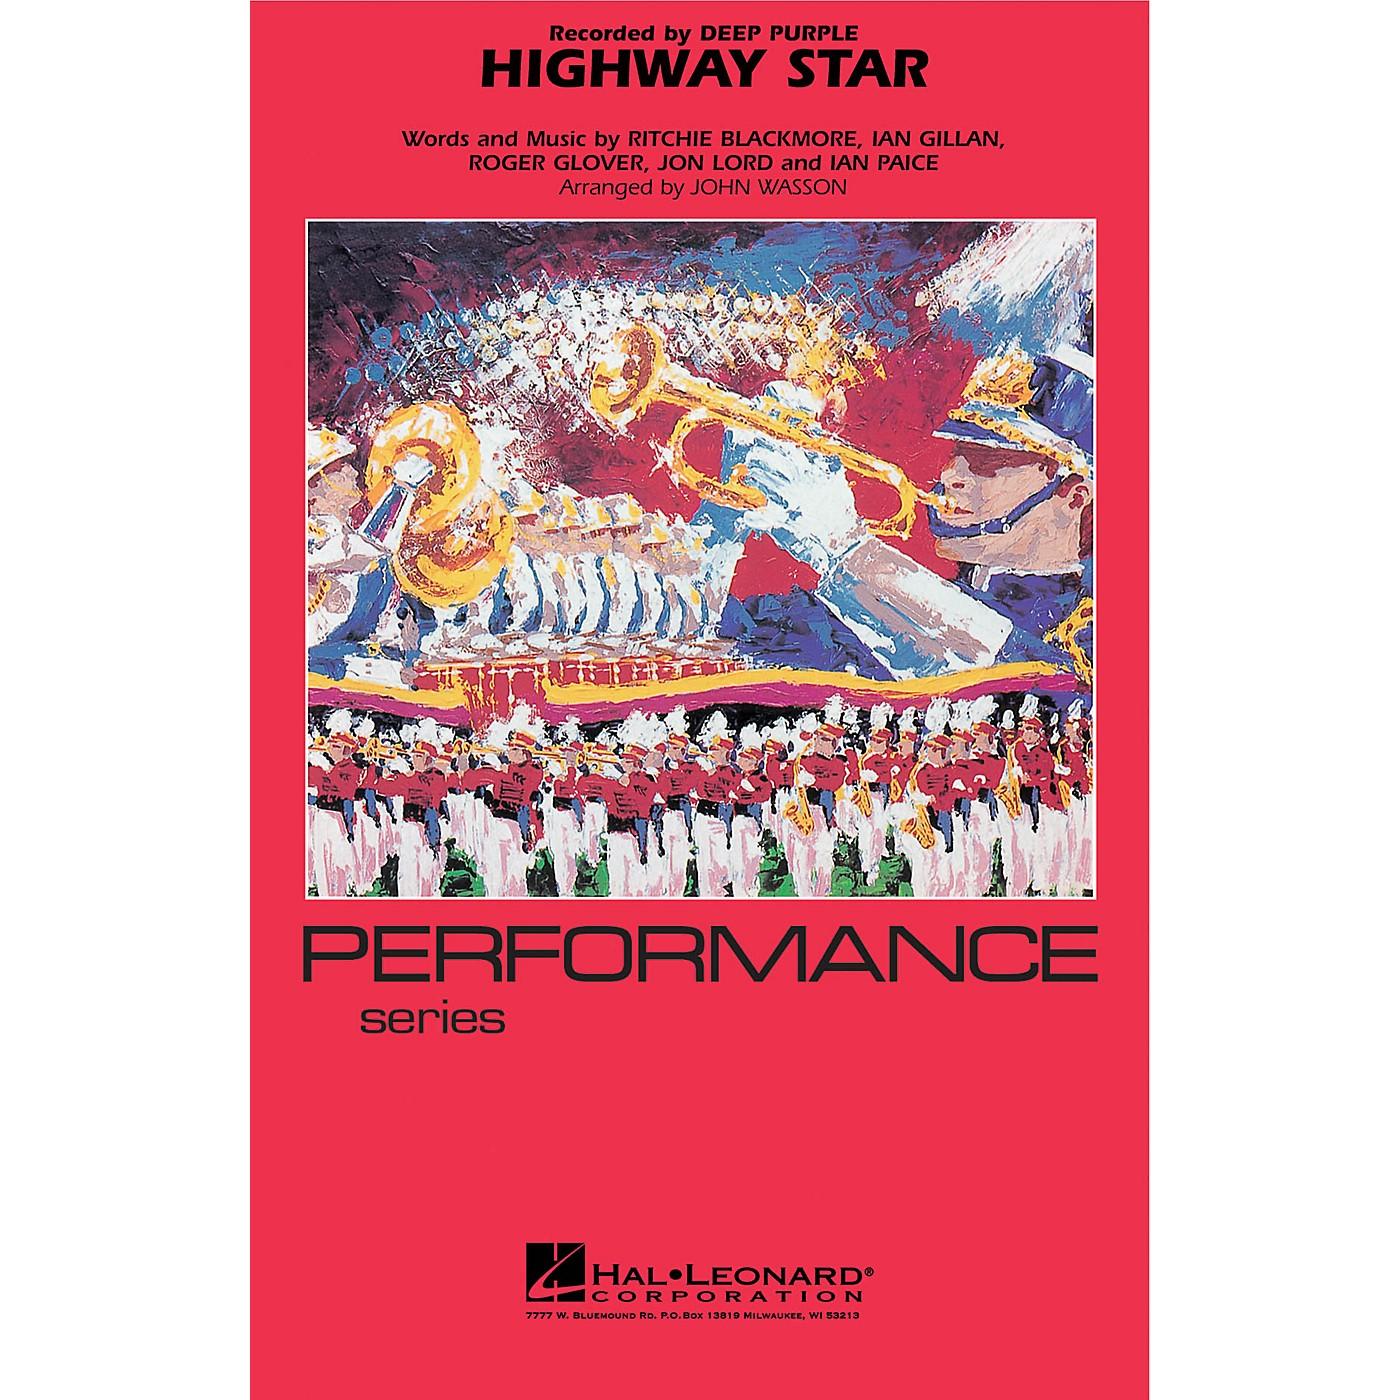 Hal Leonard Highway Star Marching Band Level 4 Arranged by John Wasson thumbnail